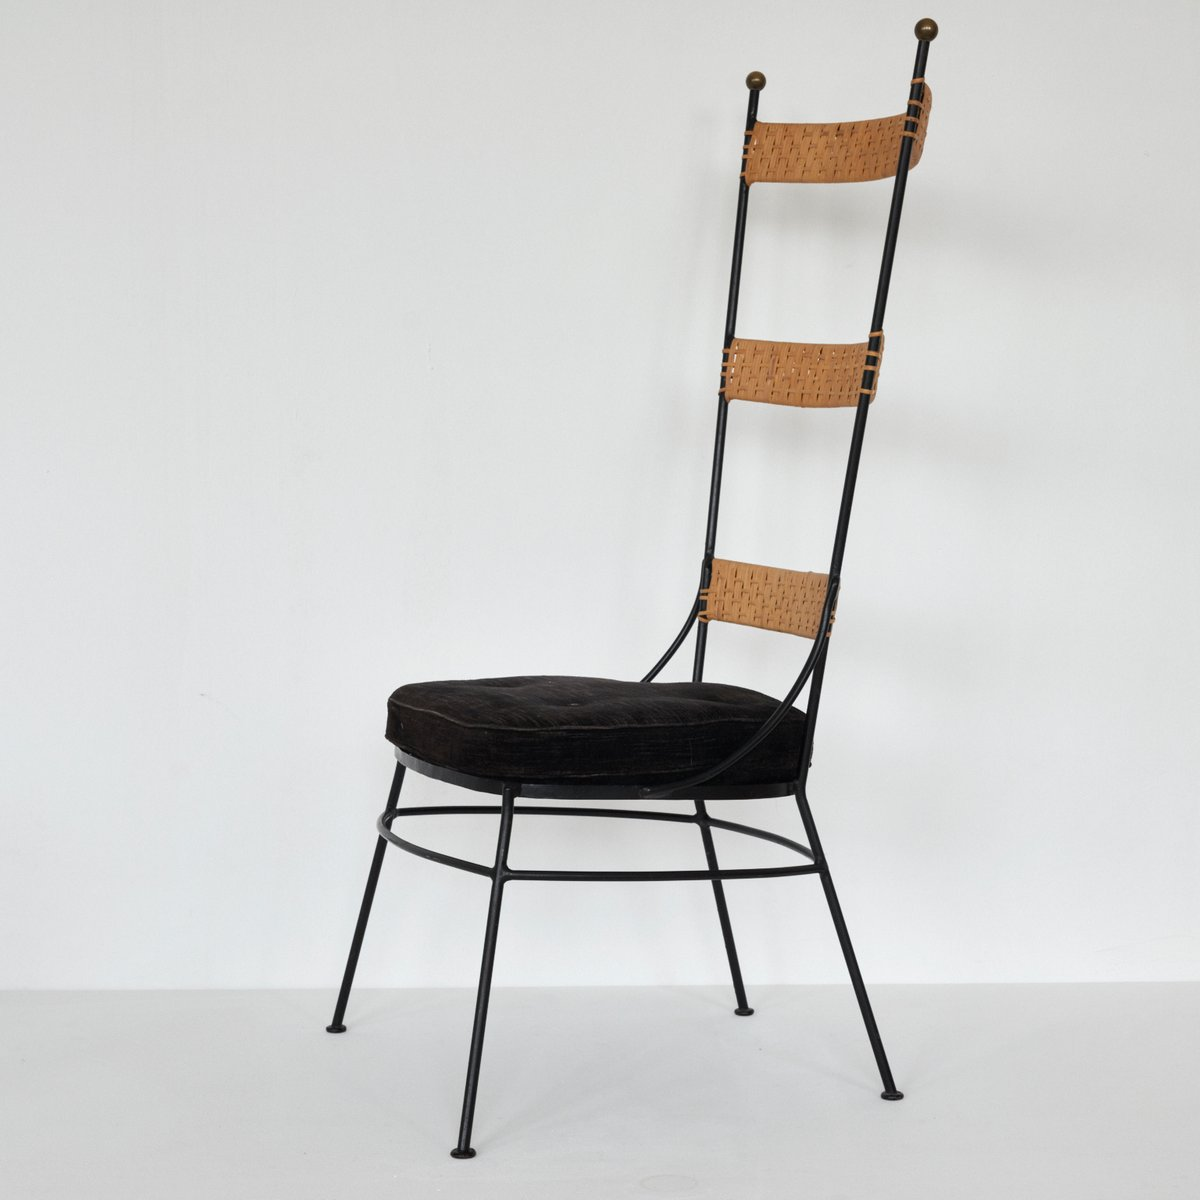 Stuhl Aus Metall & Rattan 1950er Bei Pamono Kaufen